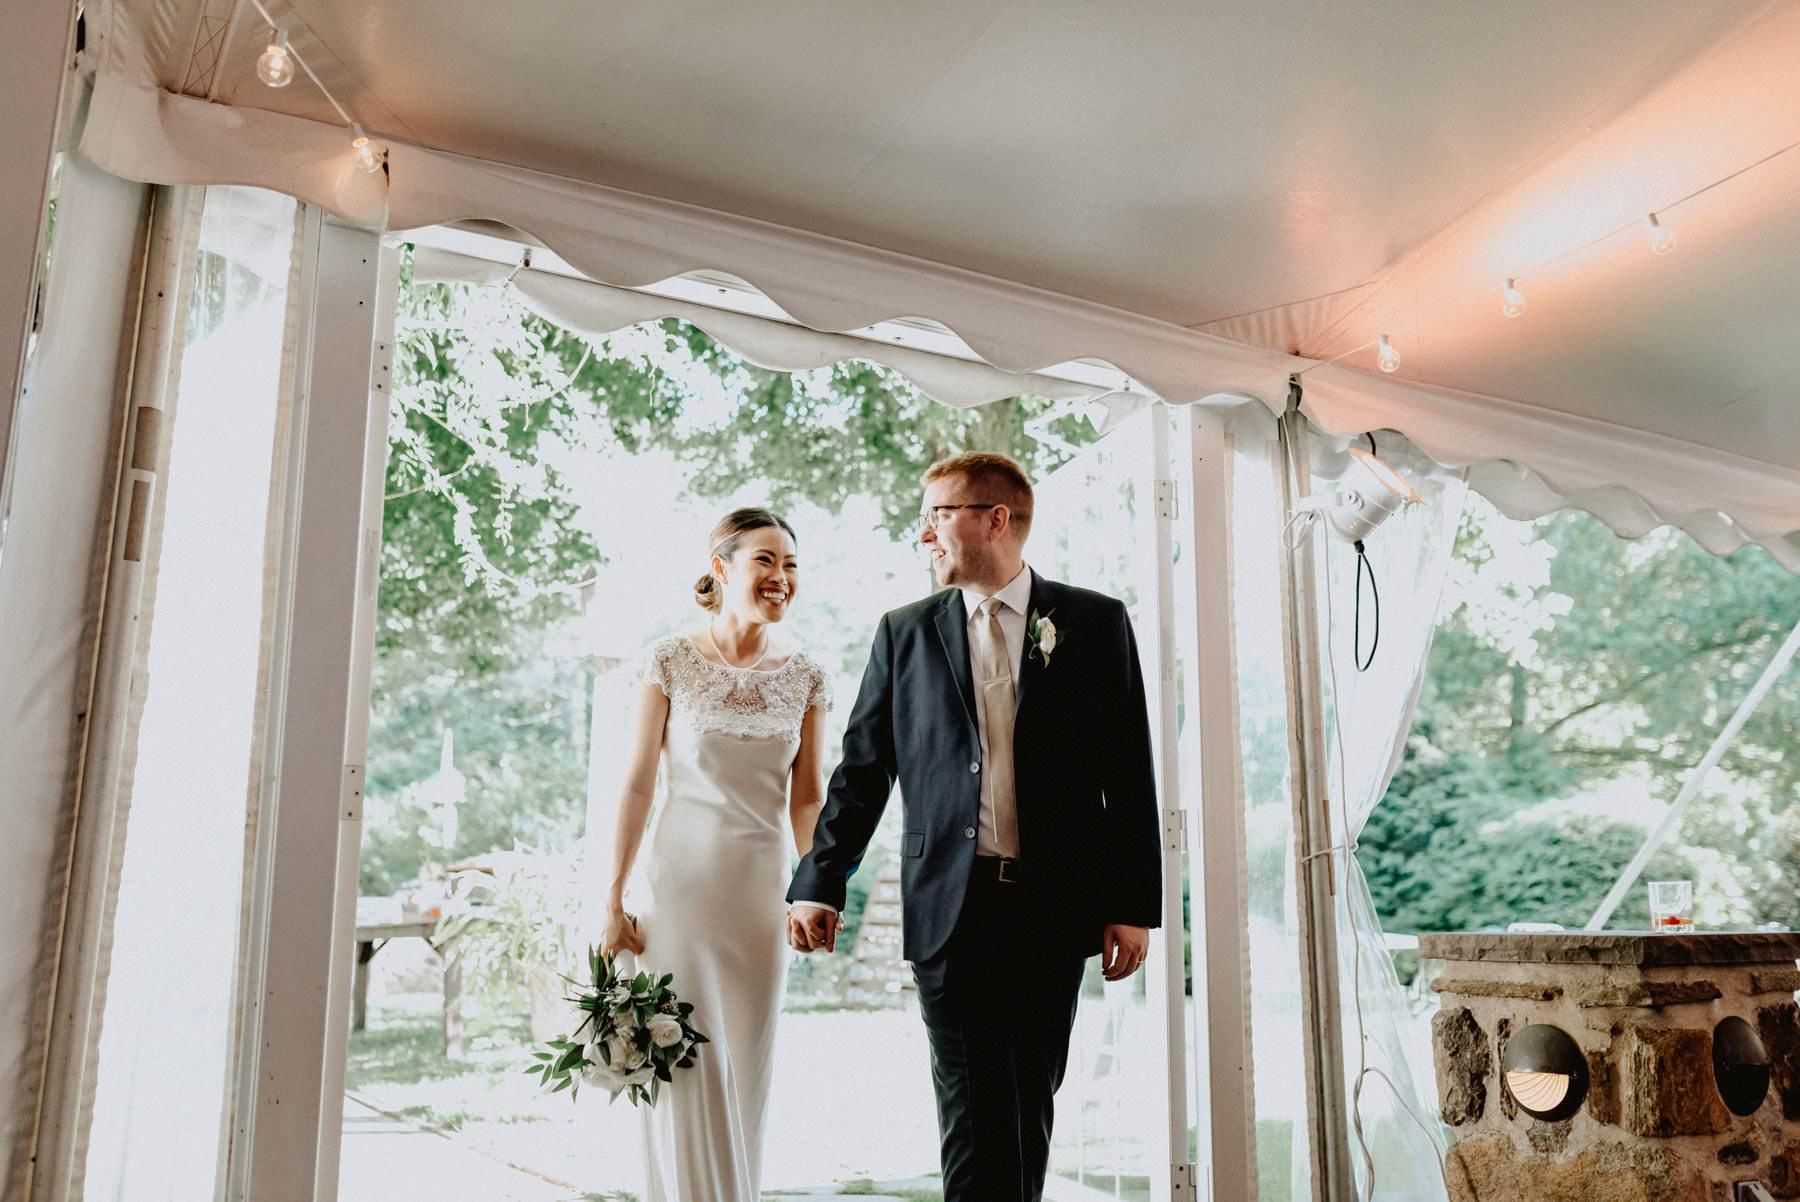 Appleford-estate-wedding-114.jpg